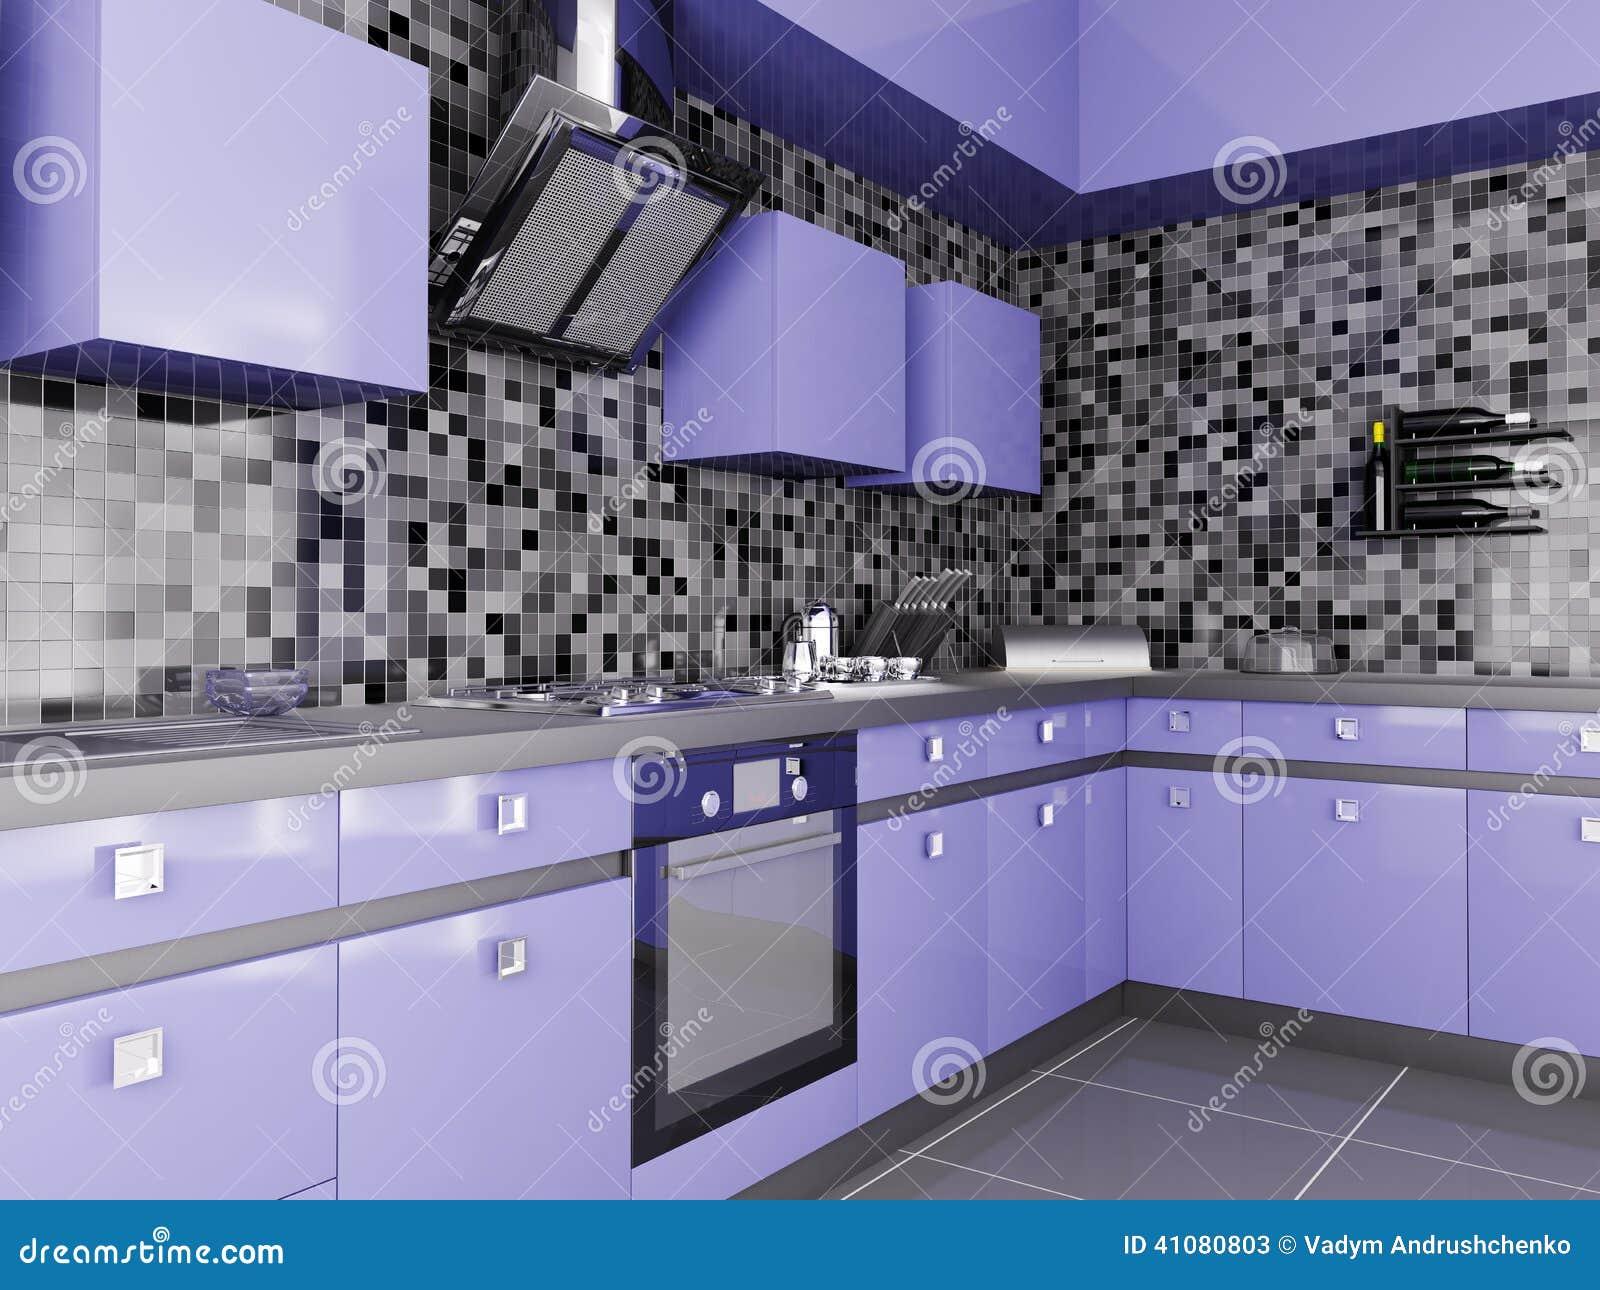 Cuisine Moderne Couleur Violet cuisine moderne 3d intérieur illustration stock